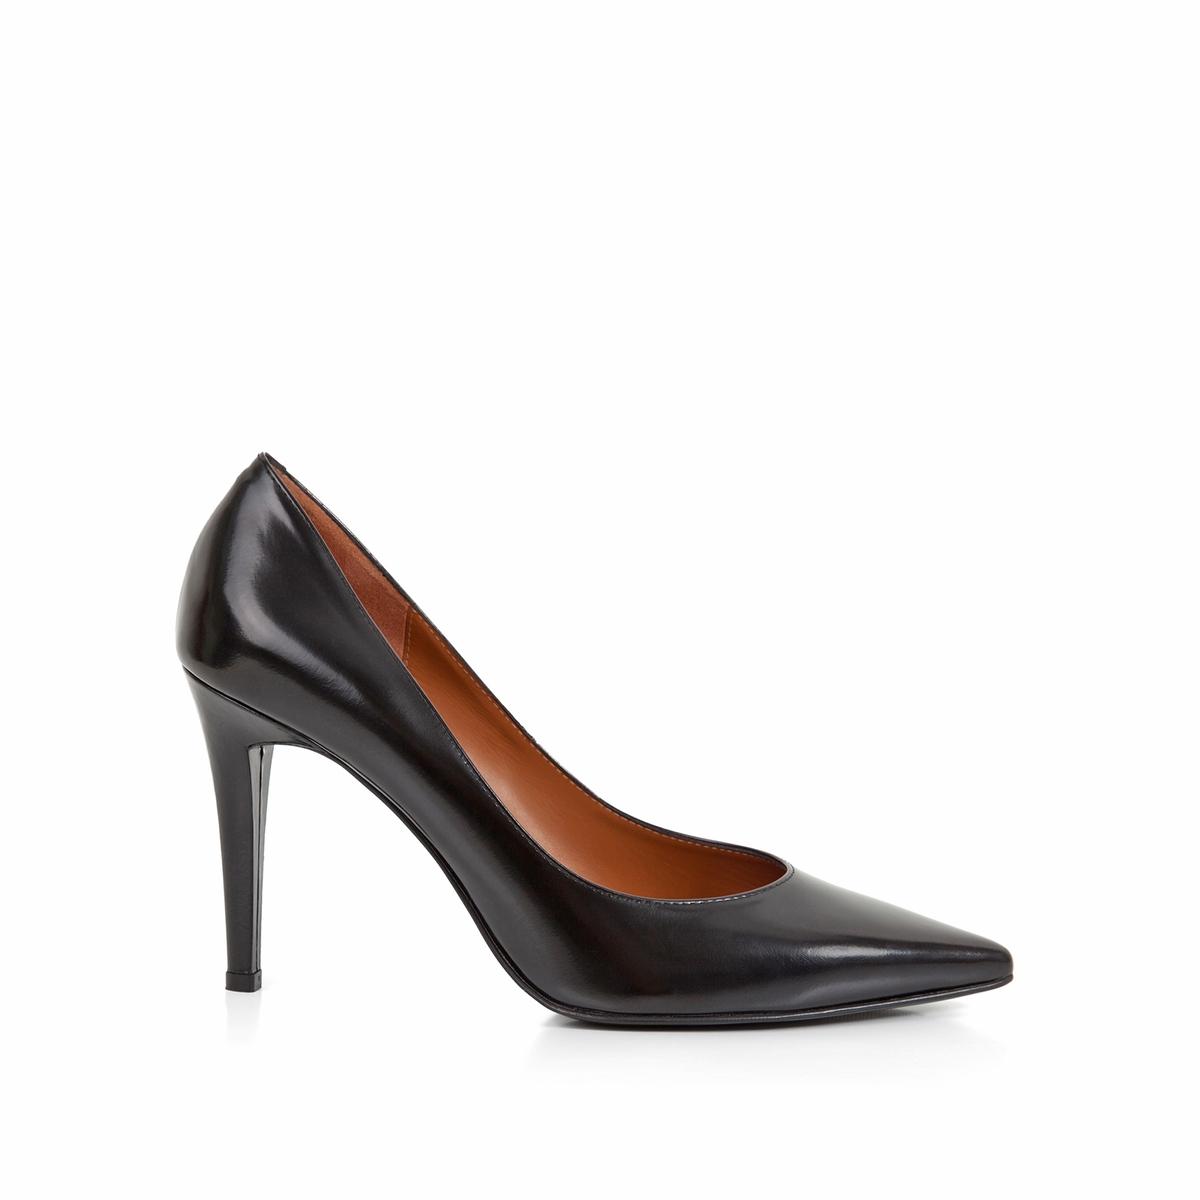 Туфли кожаные Delicia на шпильке туфли на шпильке